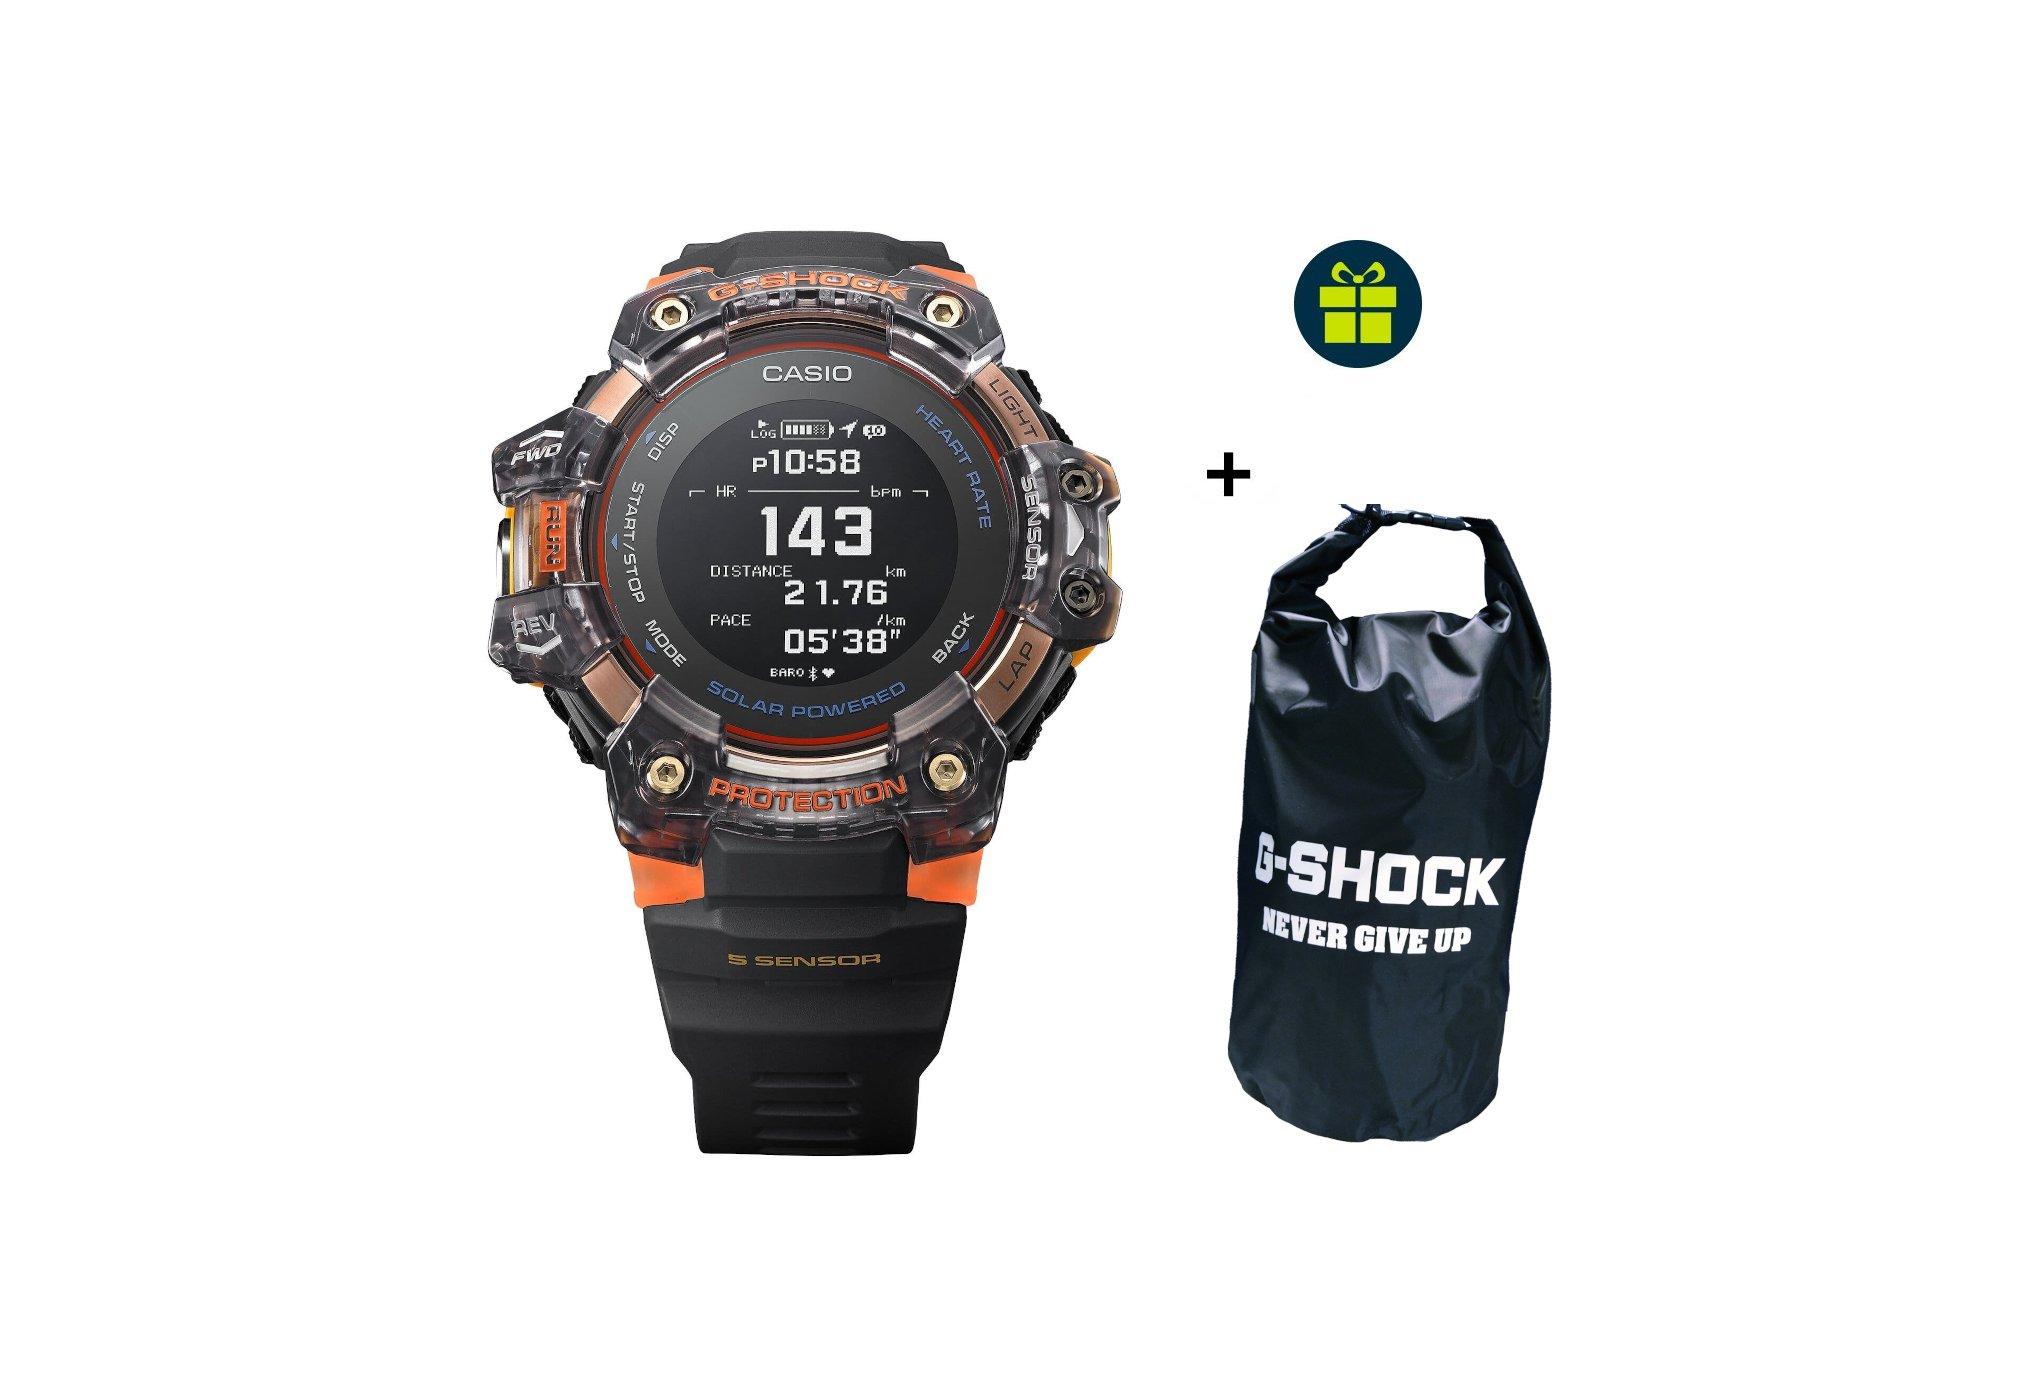 Casio G-SQUAD HR GBD-H1000-1A4ER et sac étanche G-Shock offert Cardio-Gps